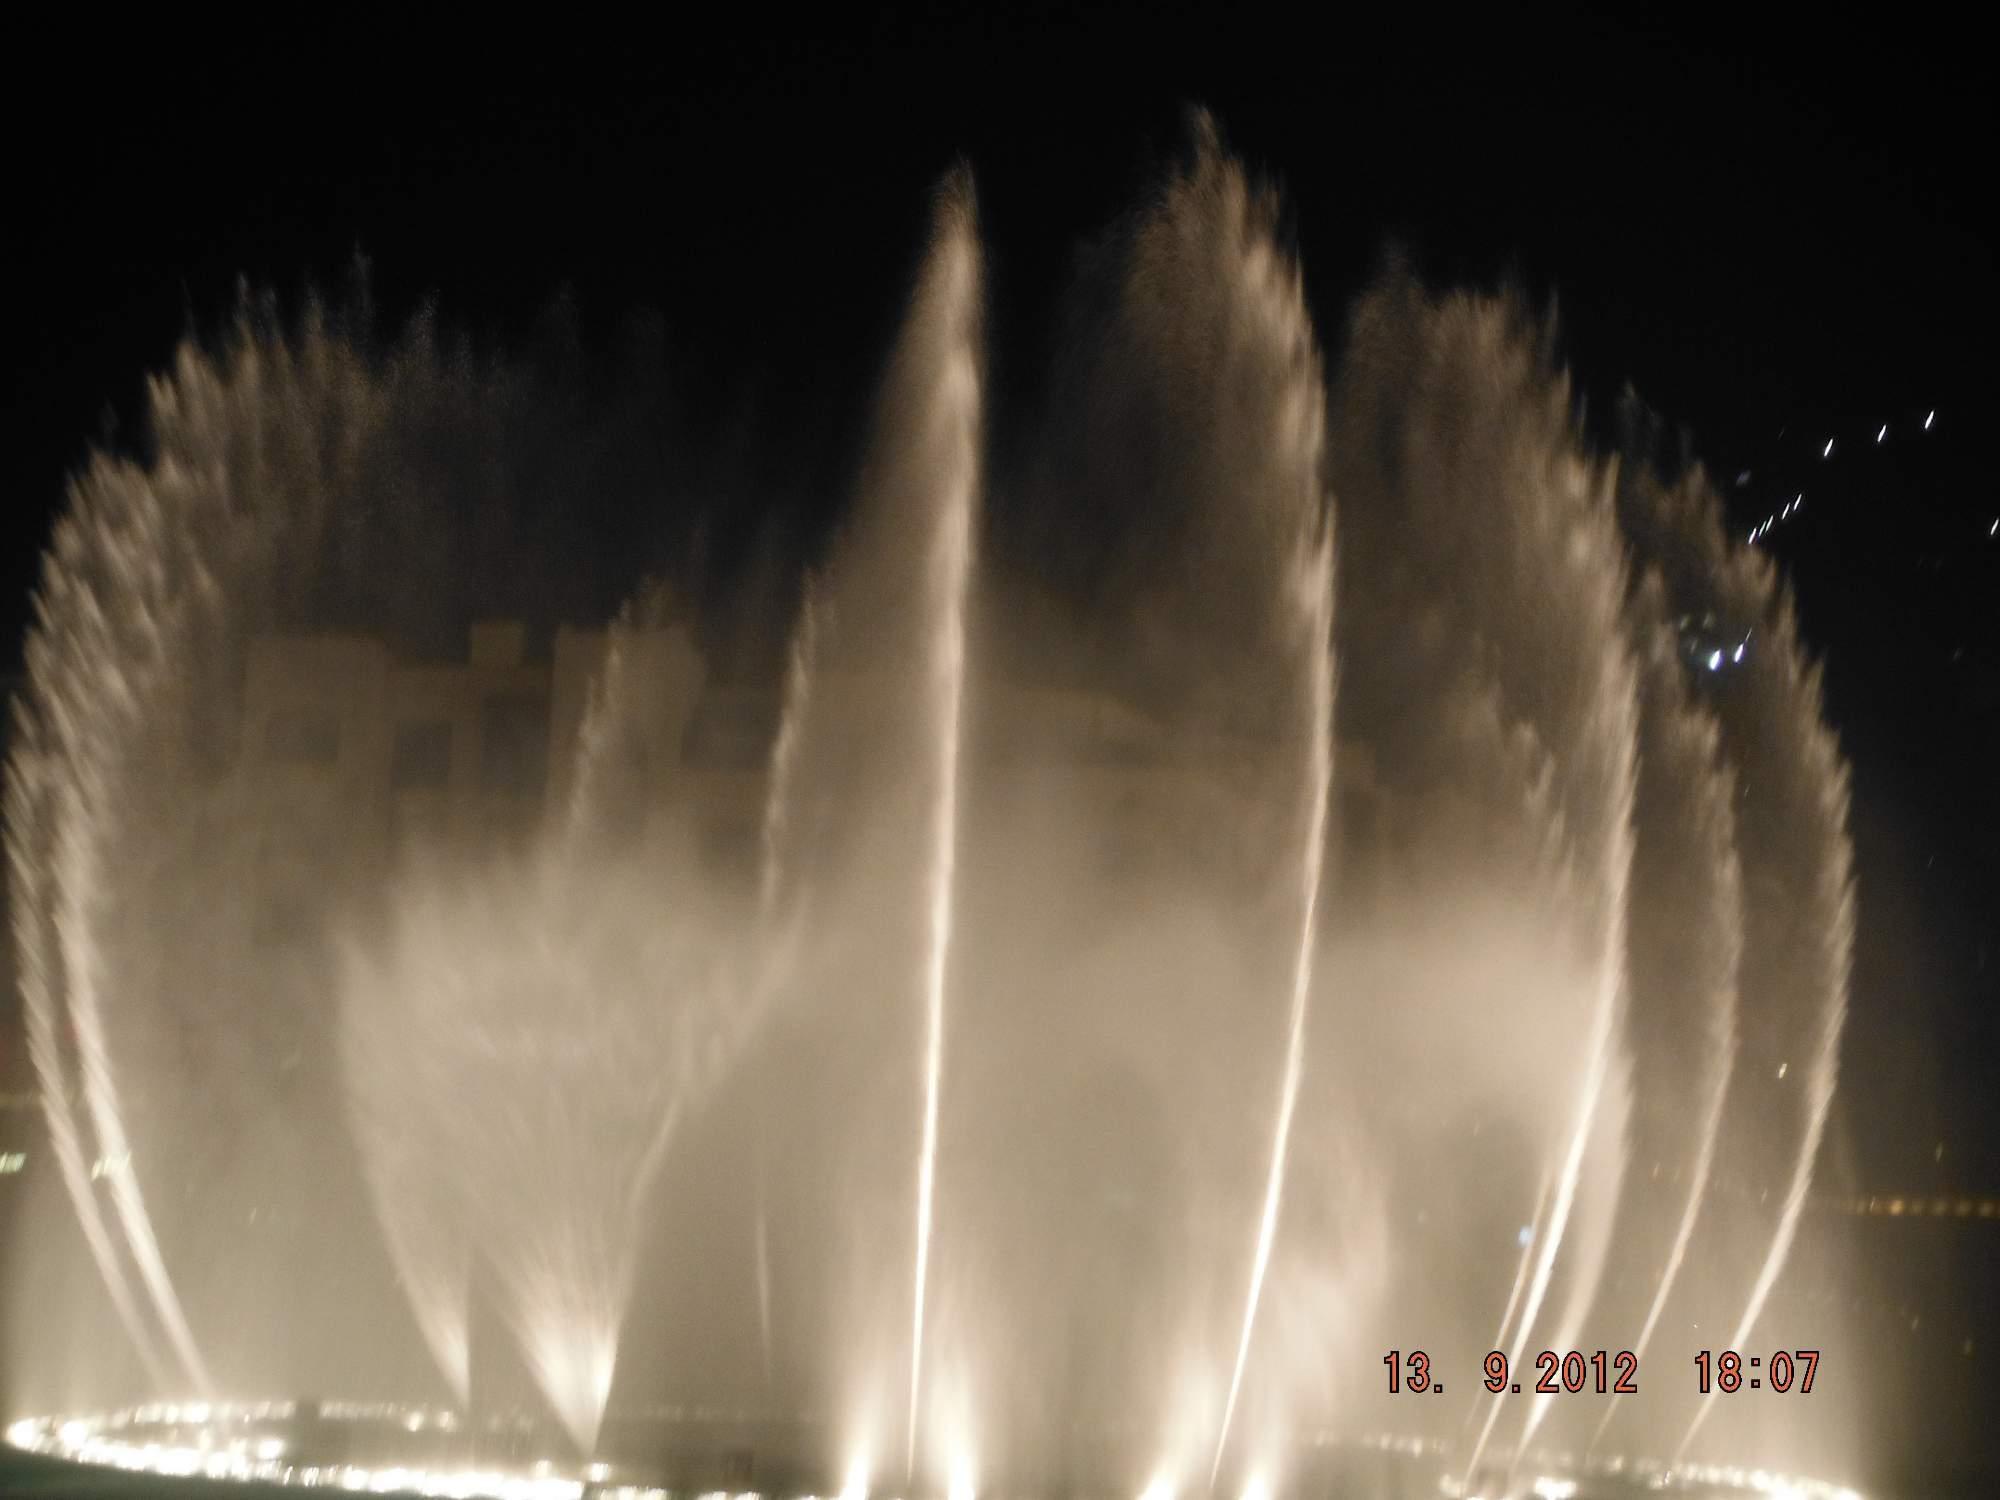 http://img24.rajce.idnes.cz/d2403/13/13214/13214242_a1e43f49e51a1daa7632f800d4edae3f/images/SAE167.jpg